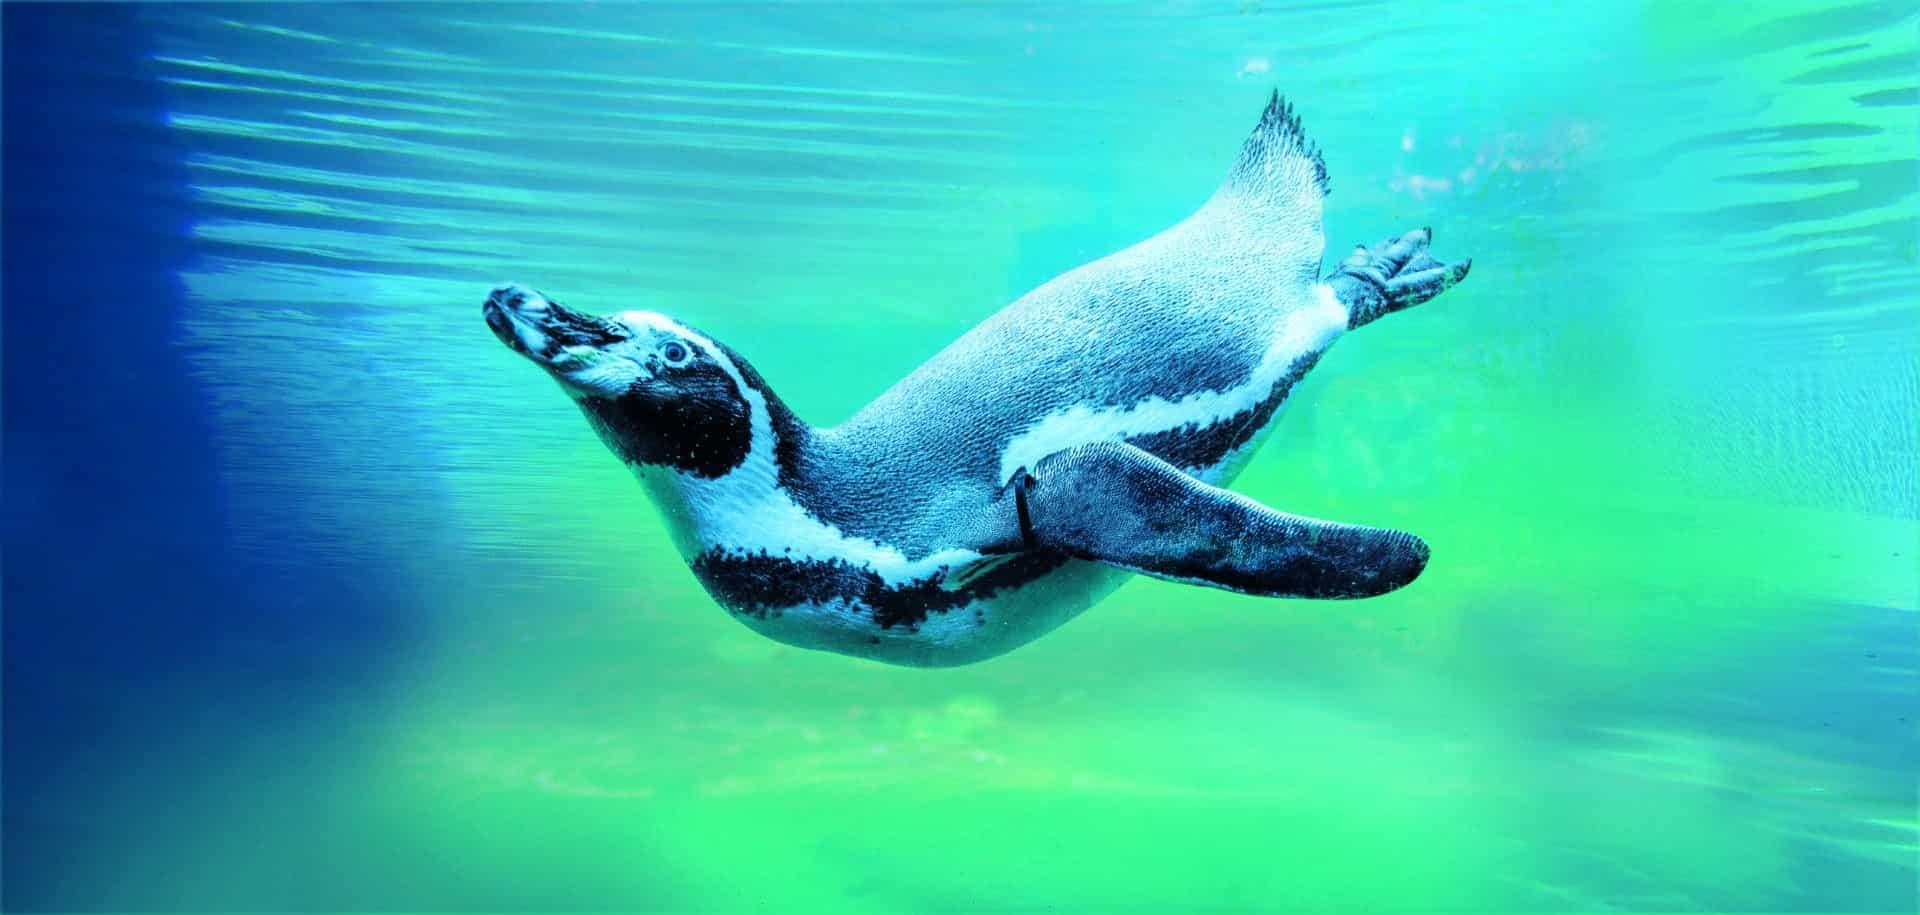 Humbolt Penguin Spheniscus Humboldti Marwell Zoo Jason Brown 5 Min